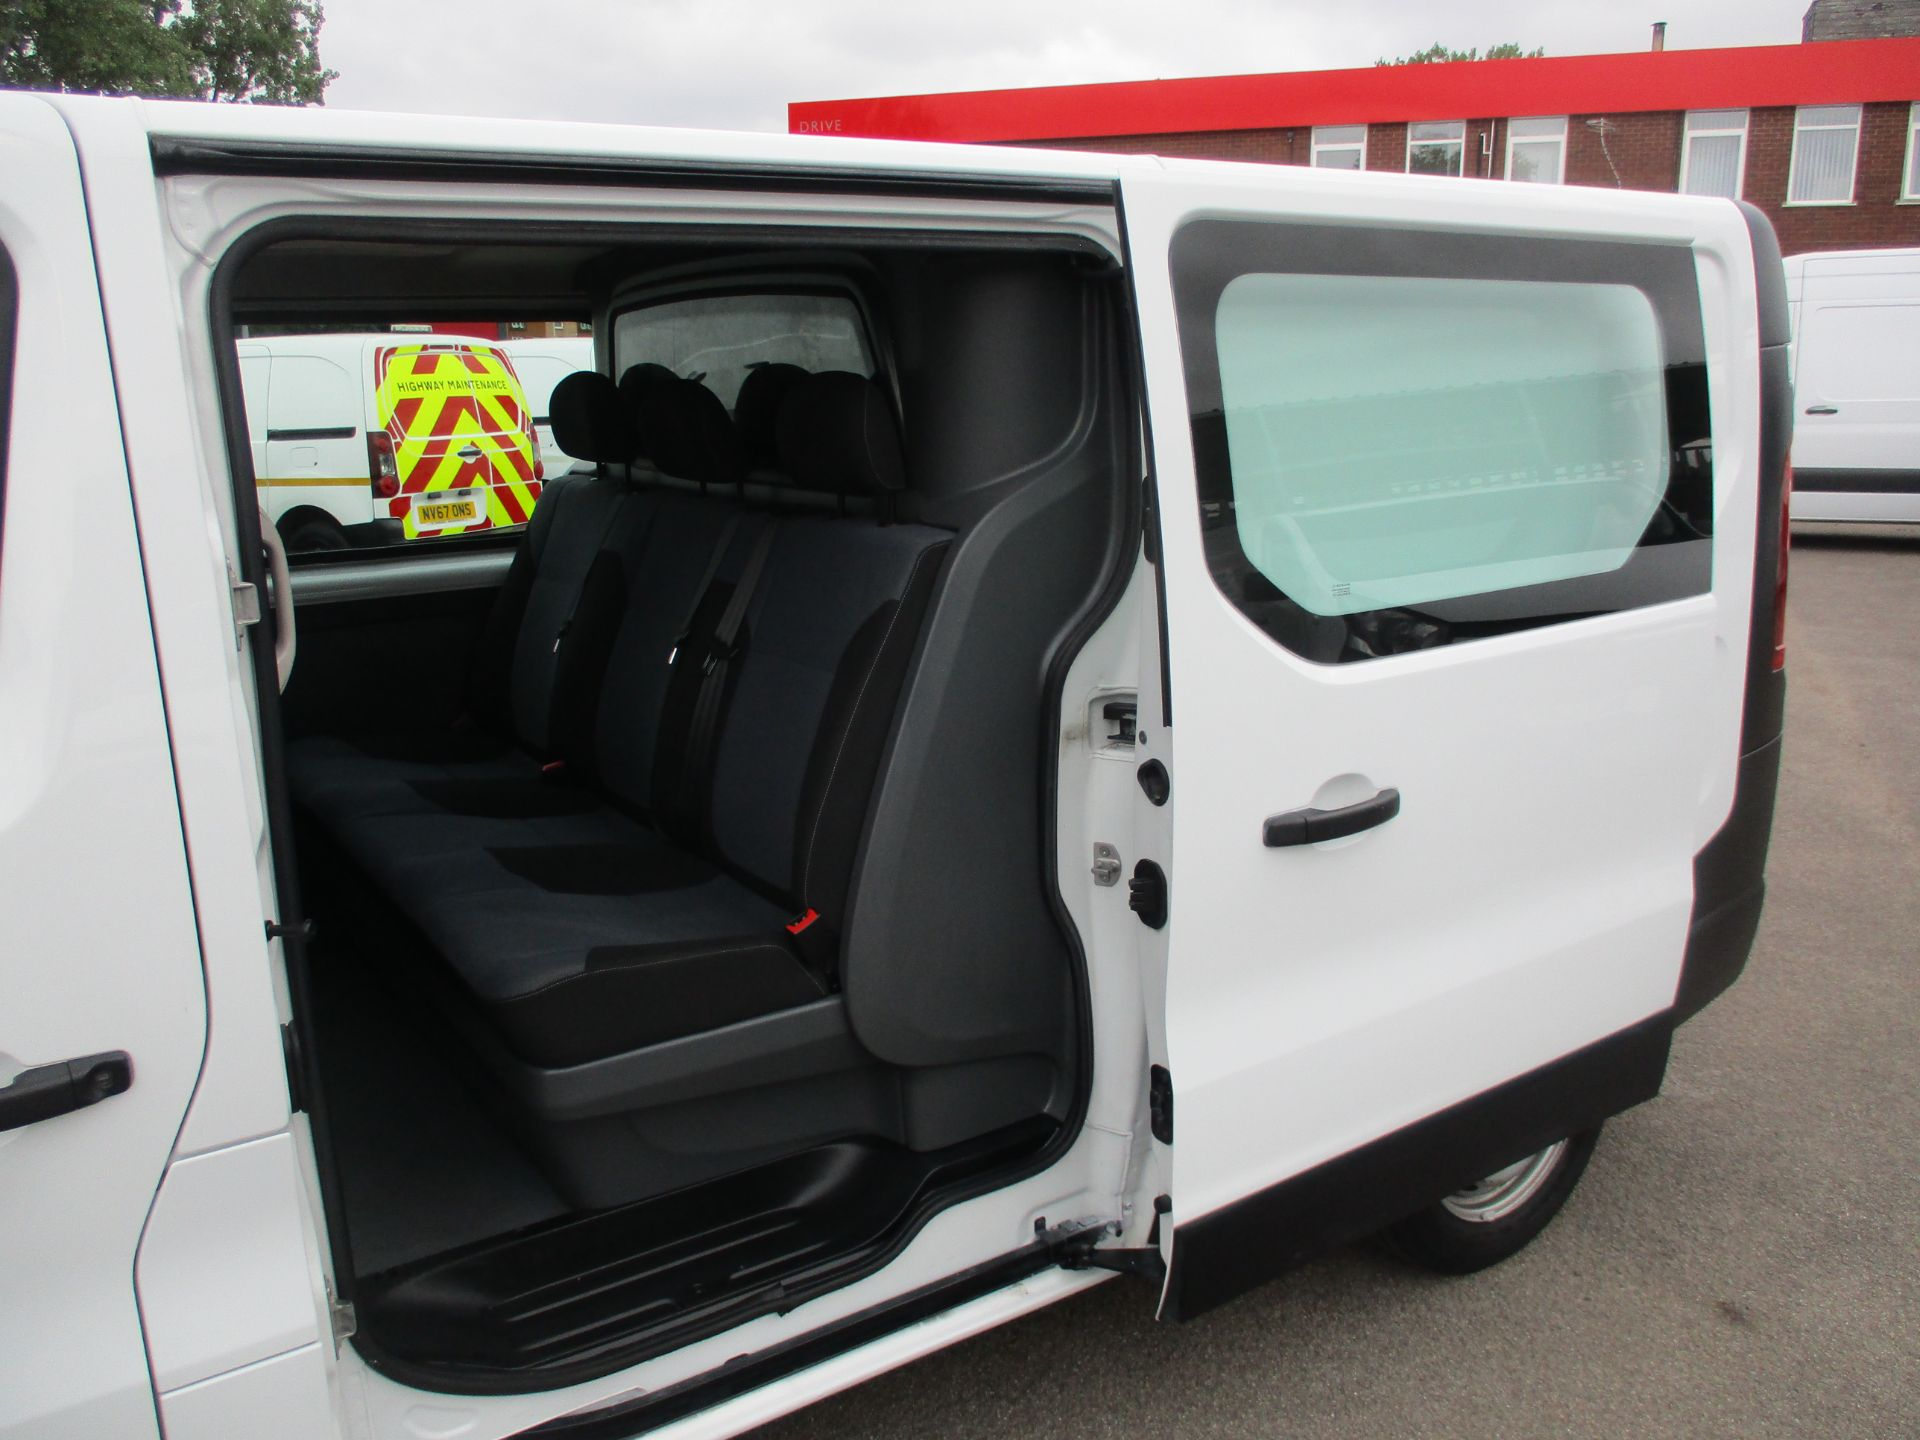 2017 Vauxhall Vivaro L2 H1 2900 1.6CDTI 120PS DOUBLE CAB  EURO 6 (DY67MYF) Image 9